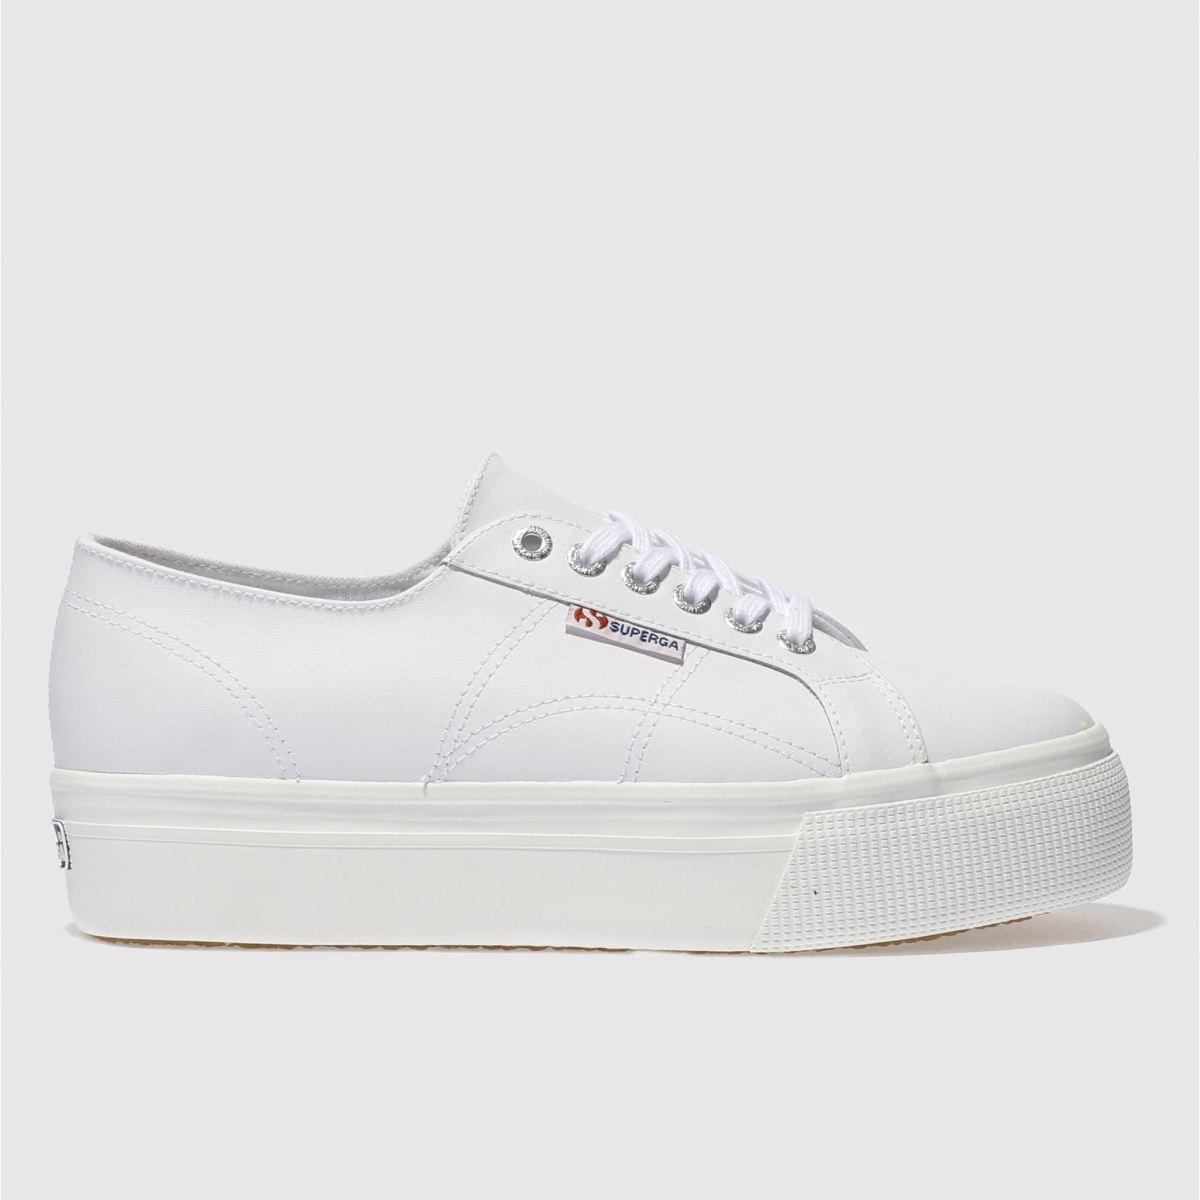 superga white 2790 flatform trainers